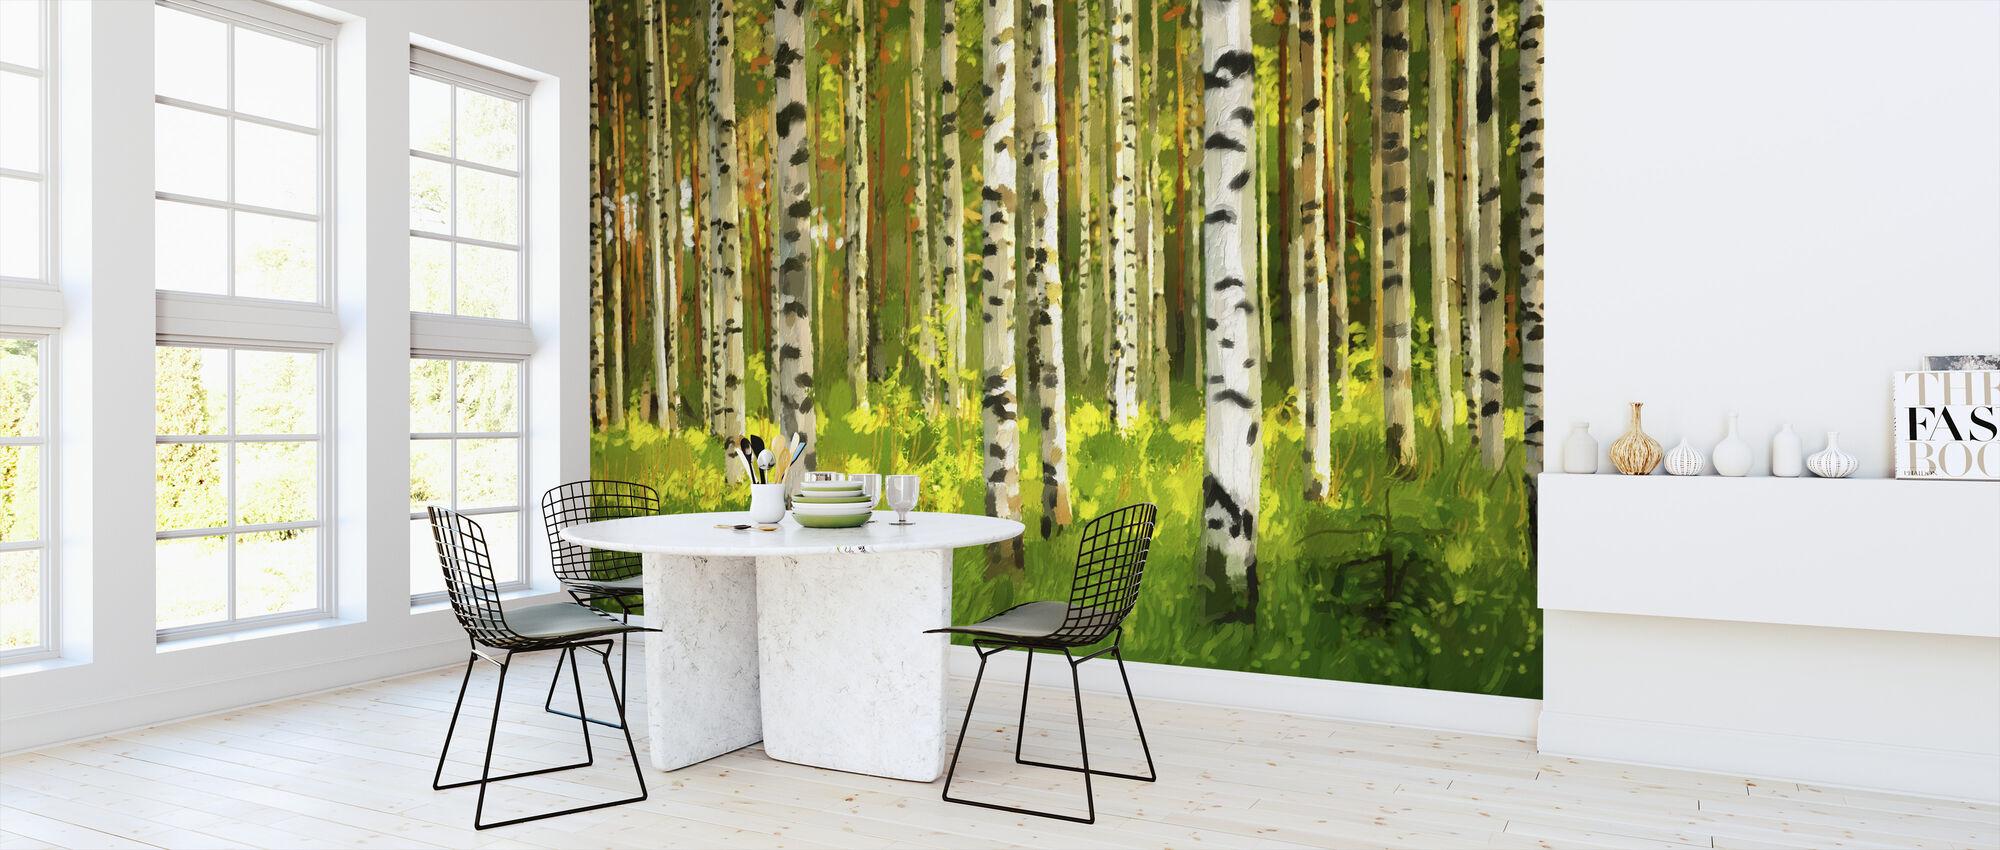 Birch Forest - Oil Painting - Wallpaper - Kitchen